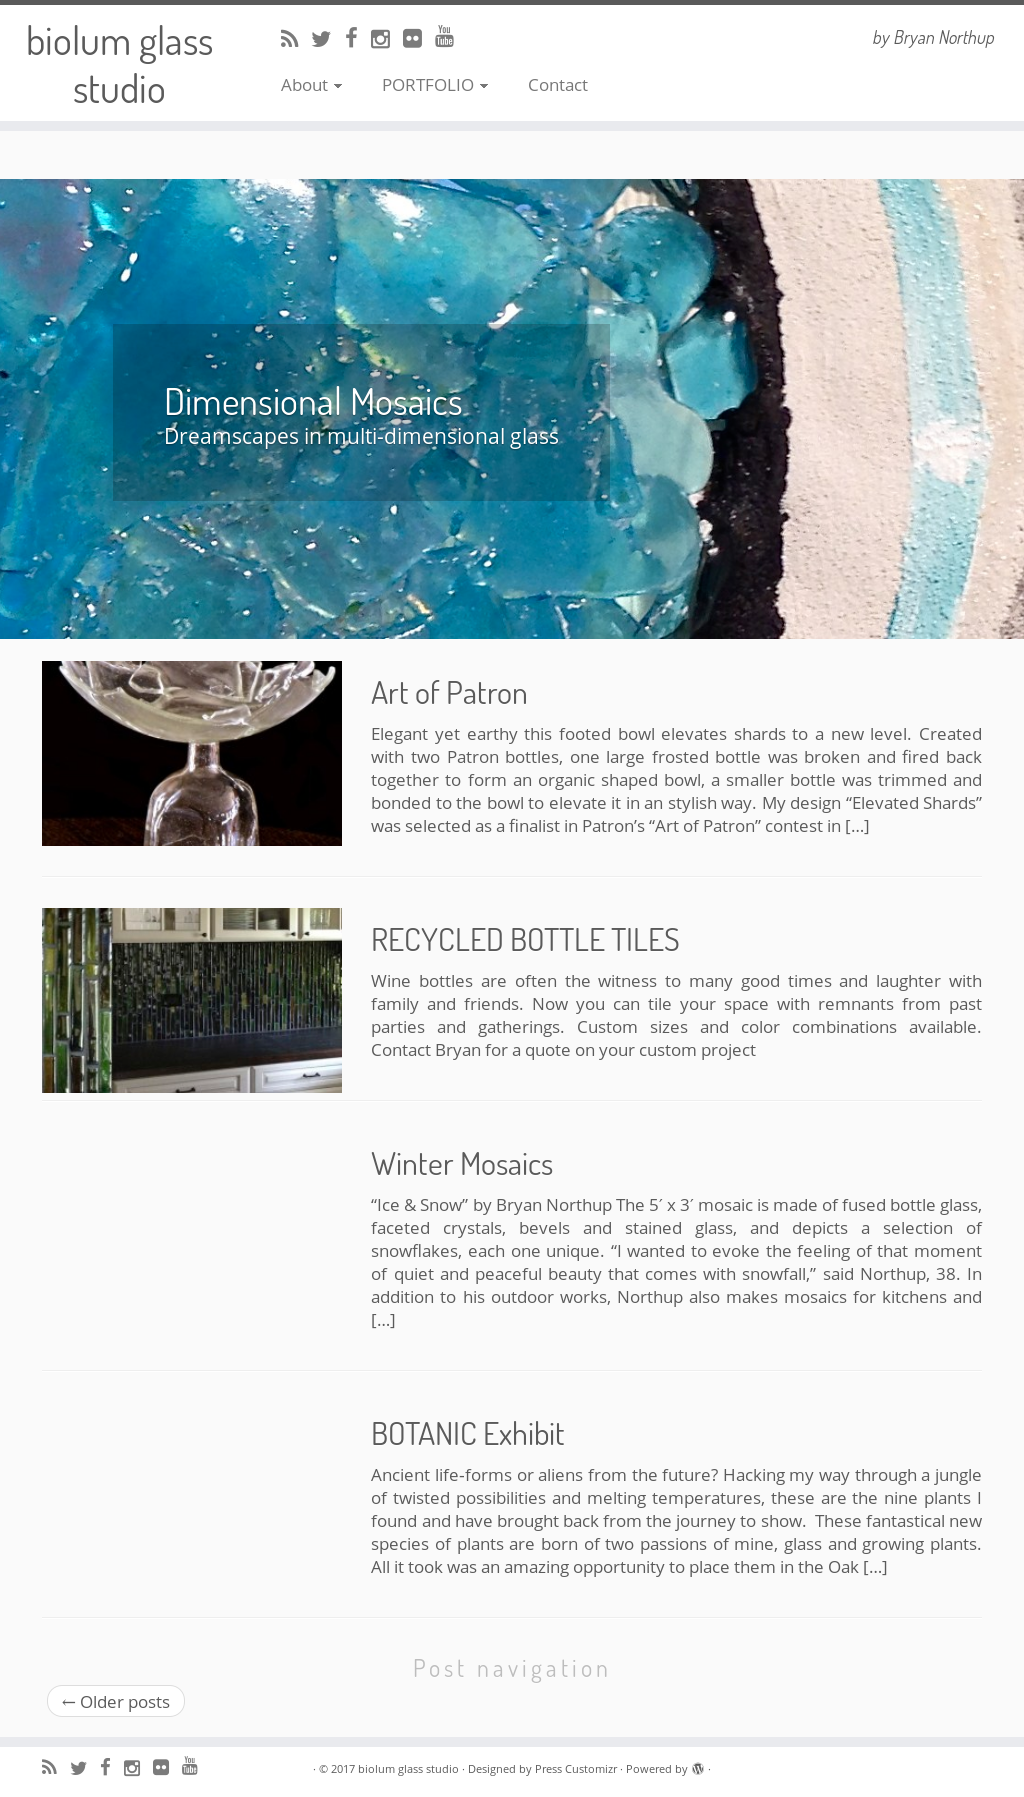 Biolum Glass Studio Competitors, Revenue and Employees